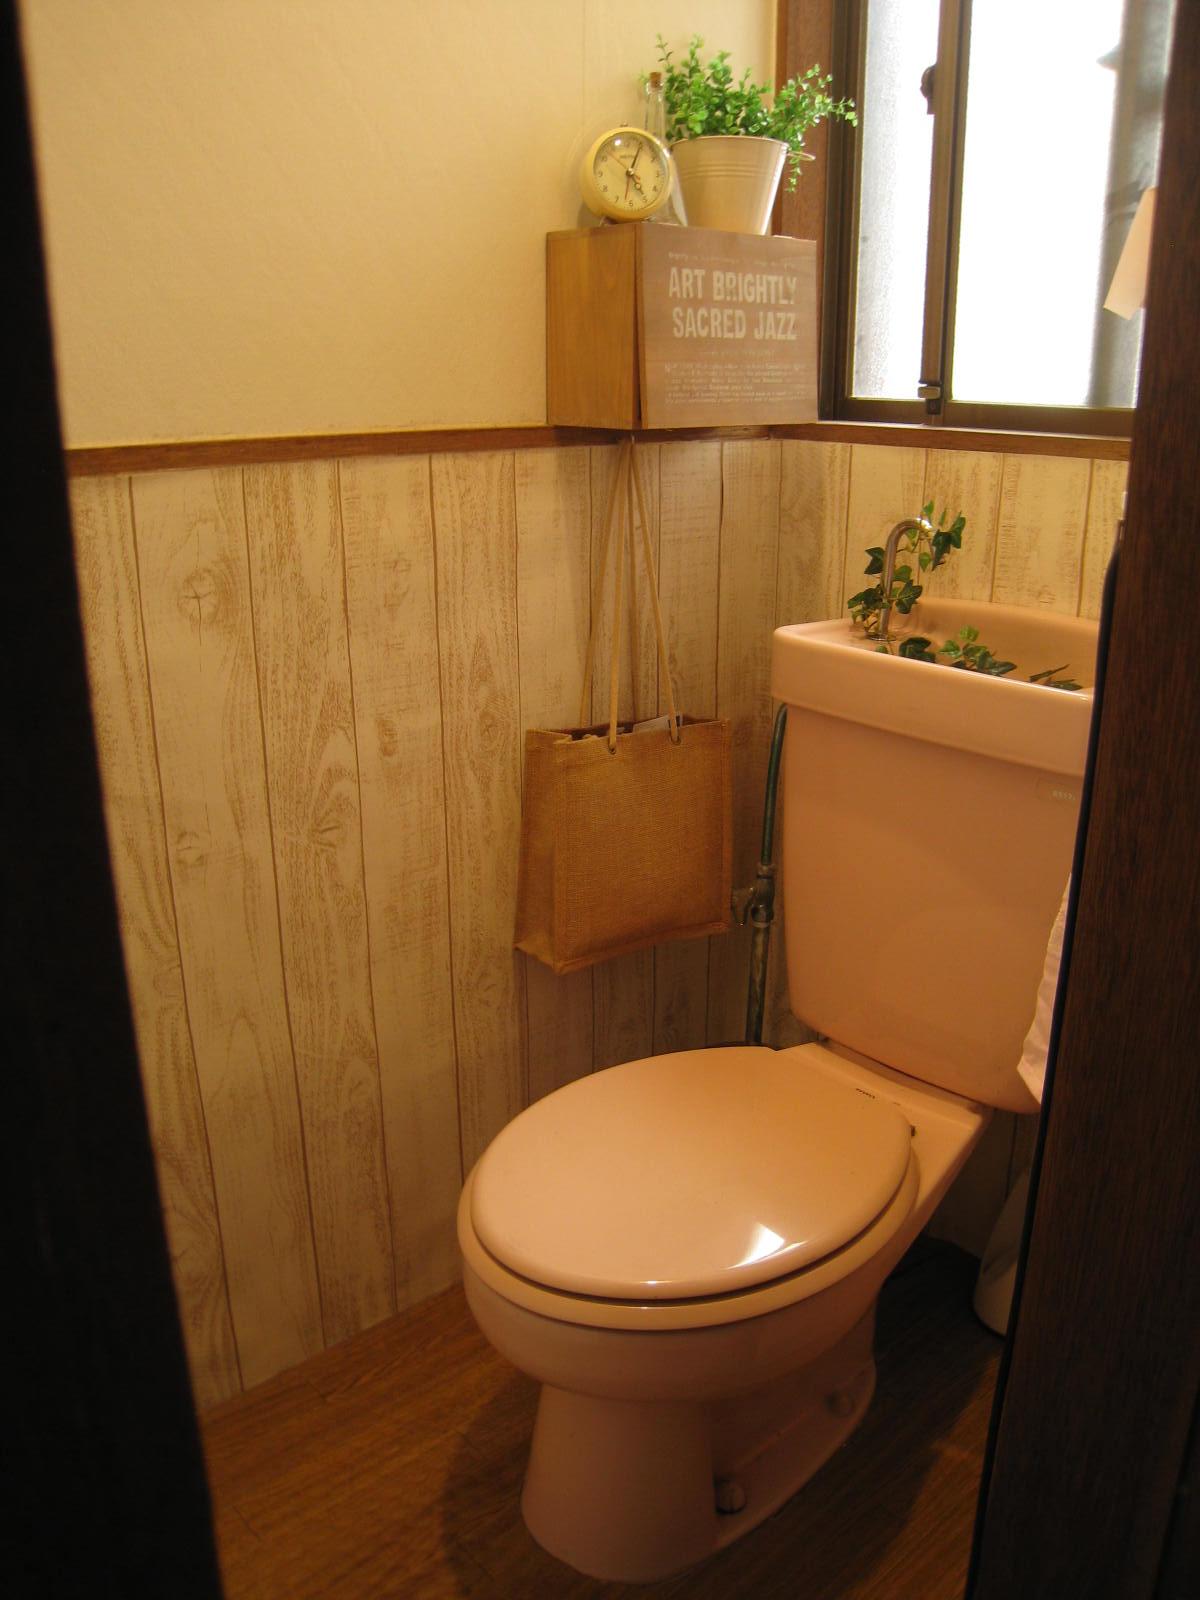 Diy Calendar Free : トイレのセルフリフォーム 平凡な一日 楽天ブログ